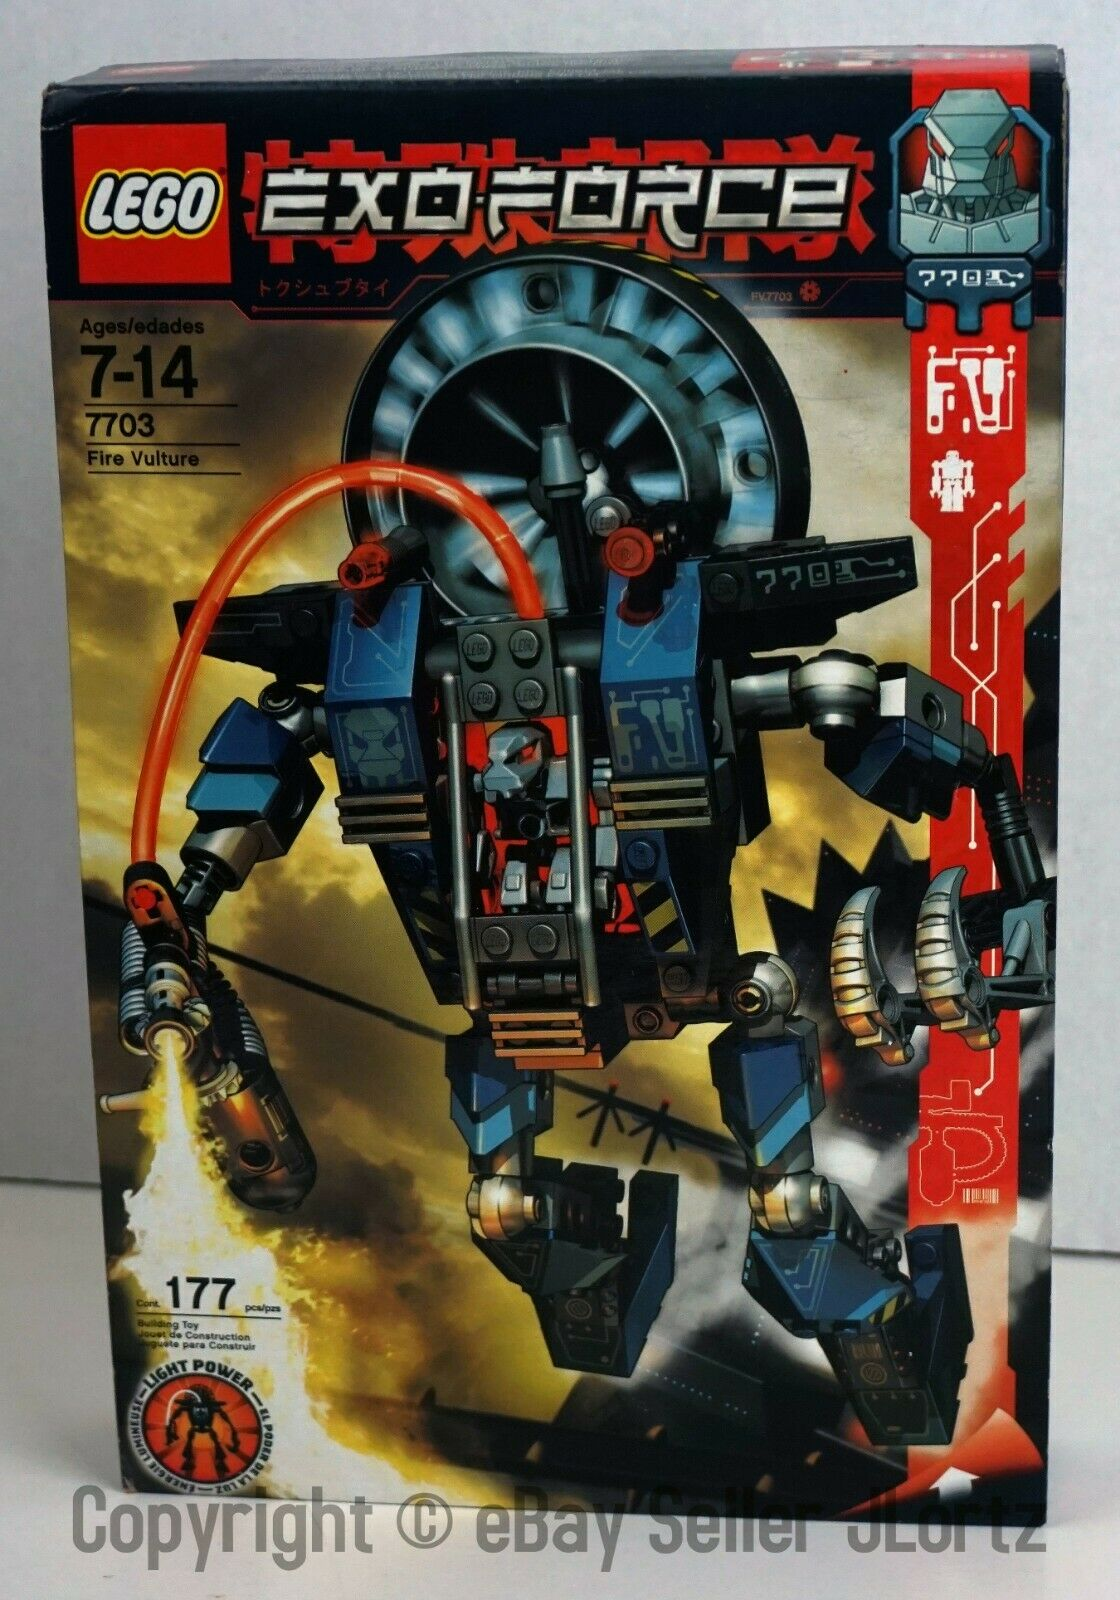 Lego 7703 Exo-Force fuego Buitre-Vintage 2006 Exo Force Nuevo